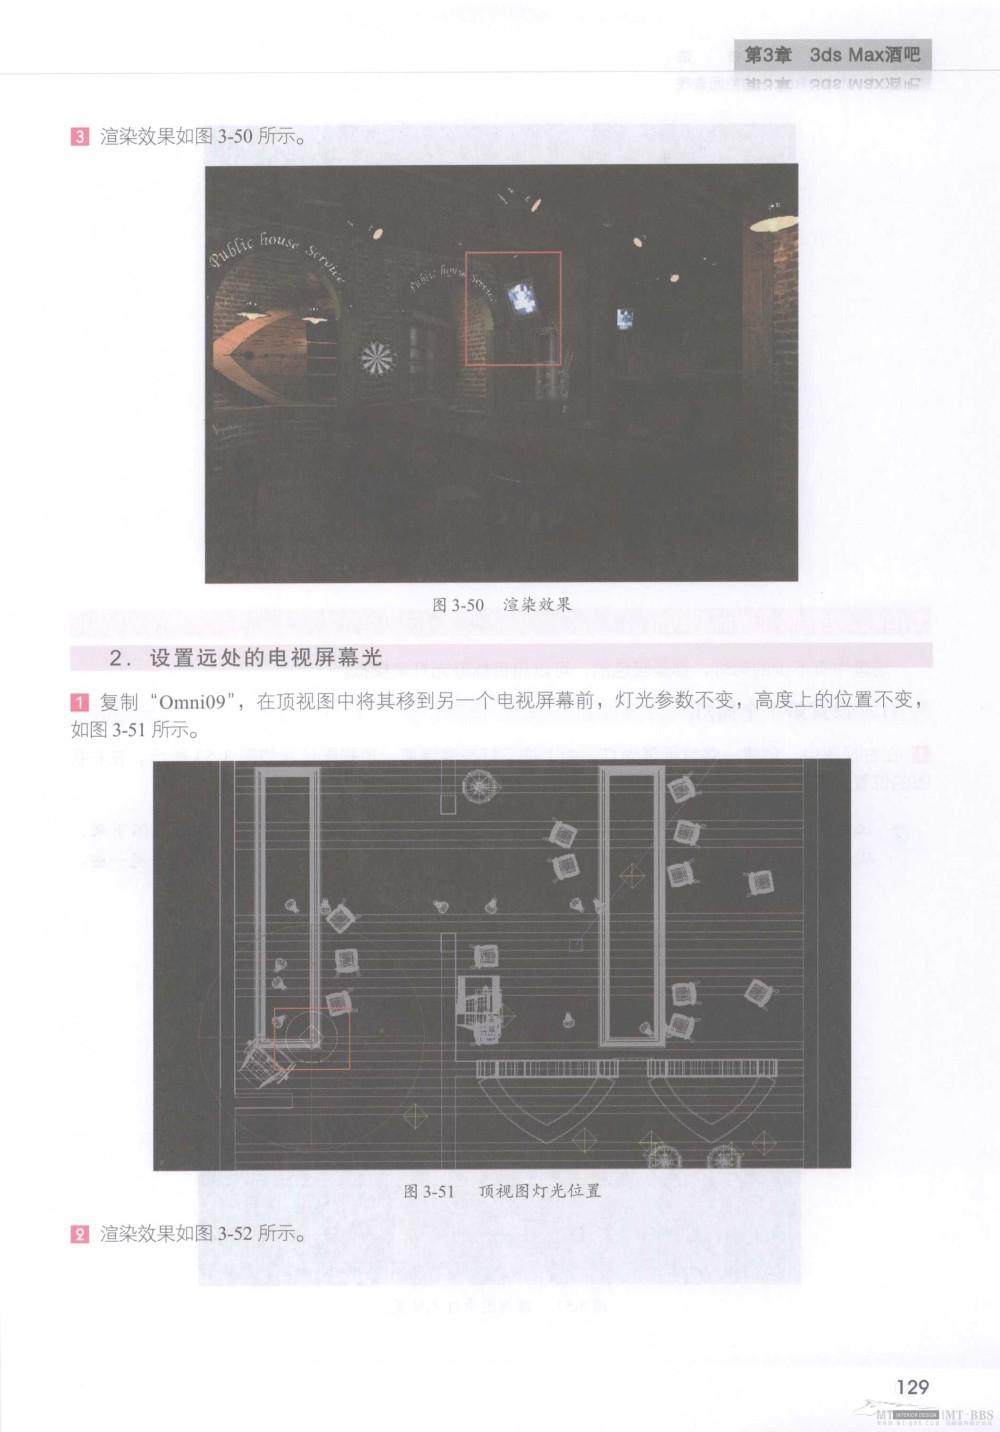 水晶石技法-3ds_Max&VRay室内空间表现_水晶石技法-3ds_Max&VRay室内空间表现_页面_135.jpg